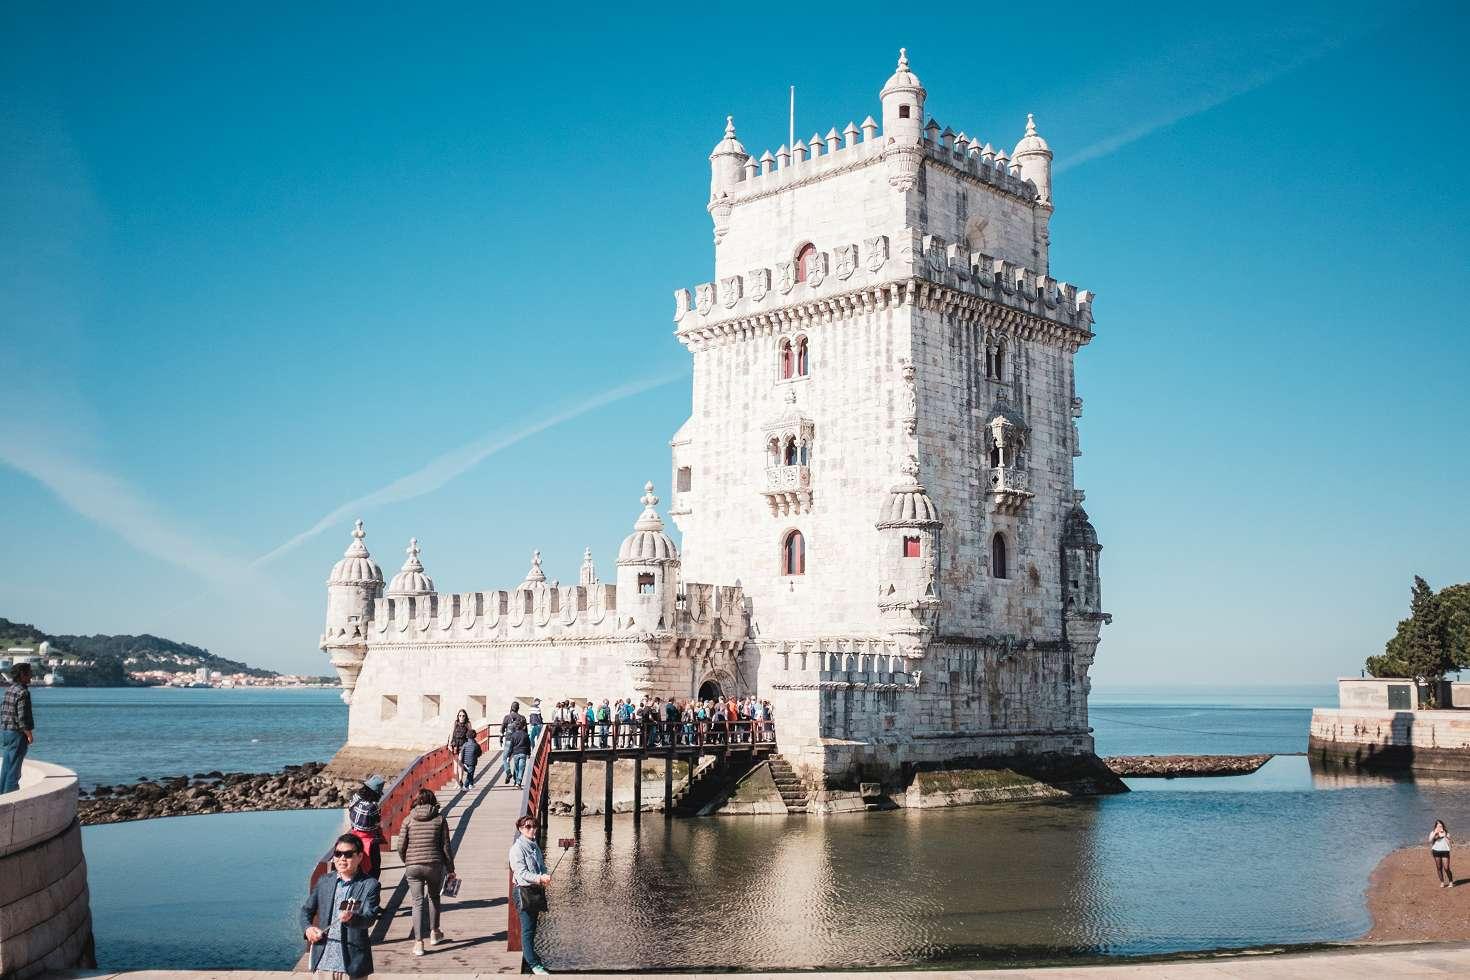 Valencia-Lissabon-Vigo-Stonehenge (15)